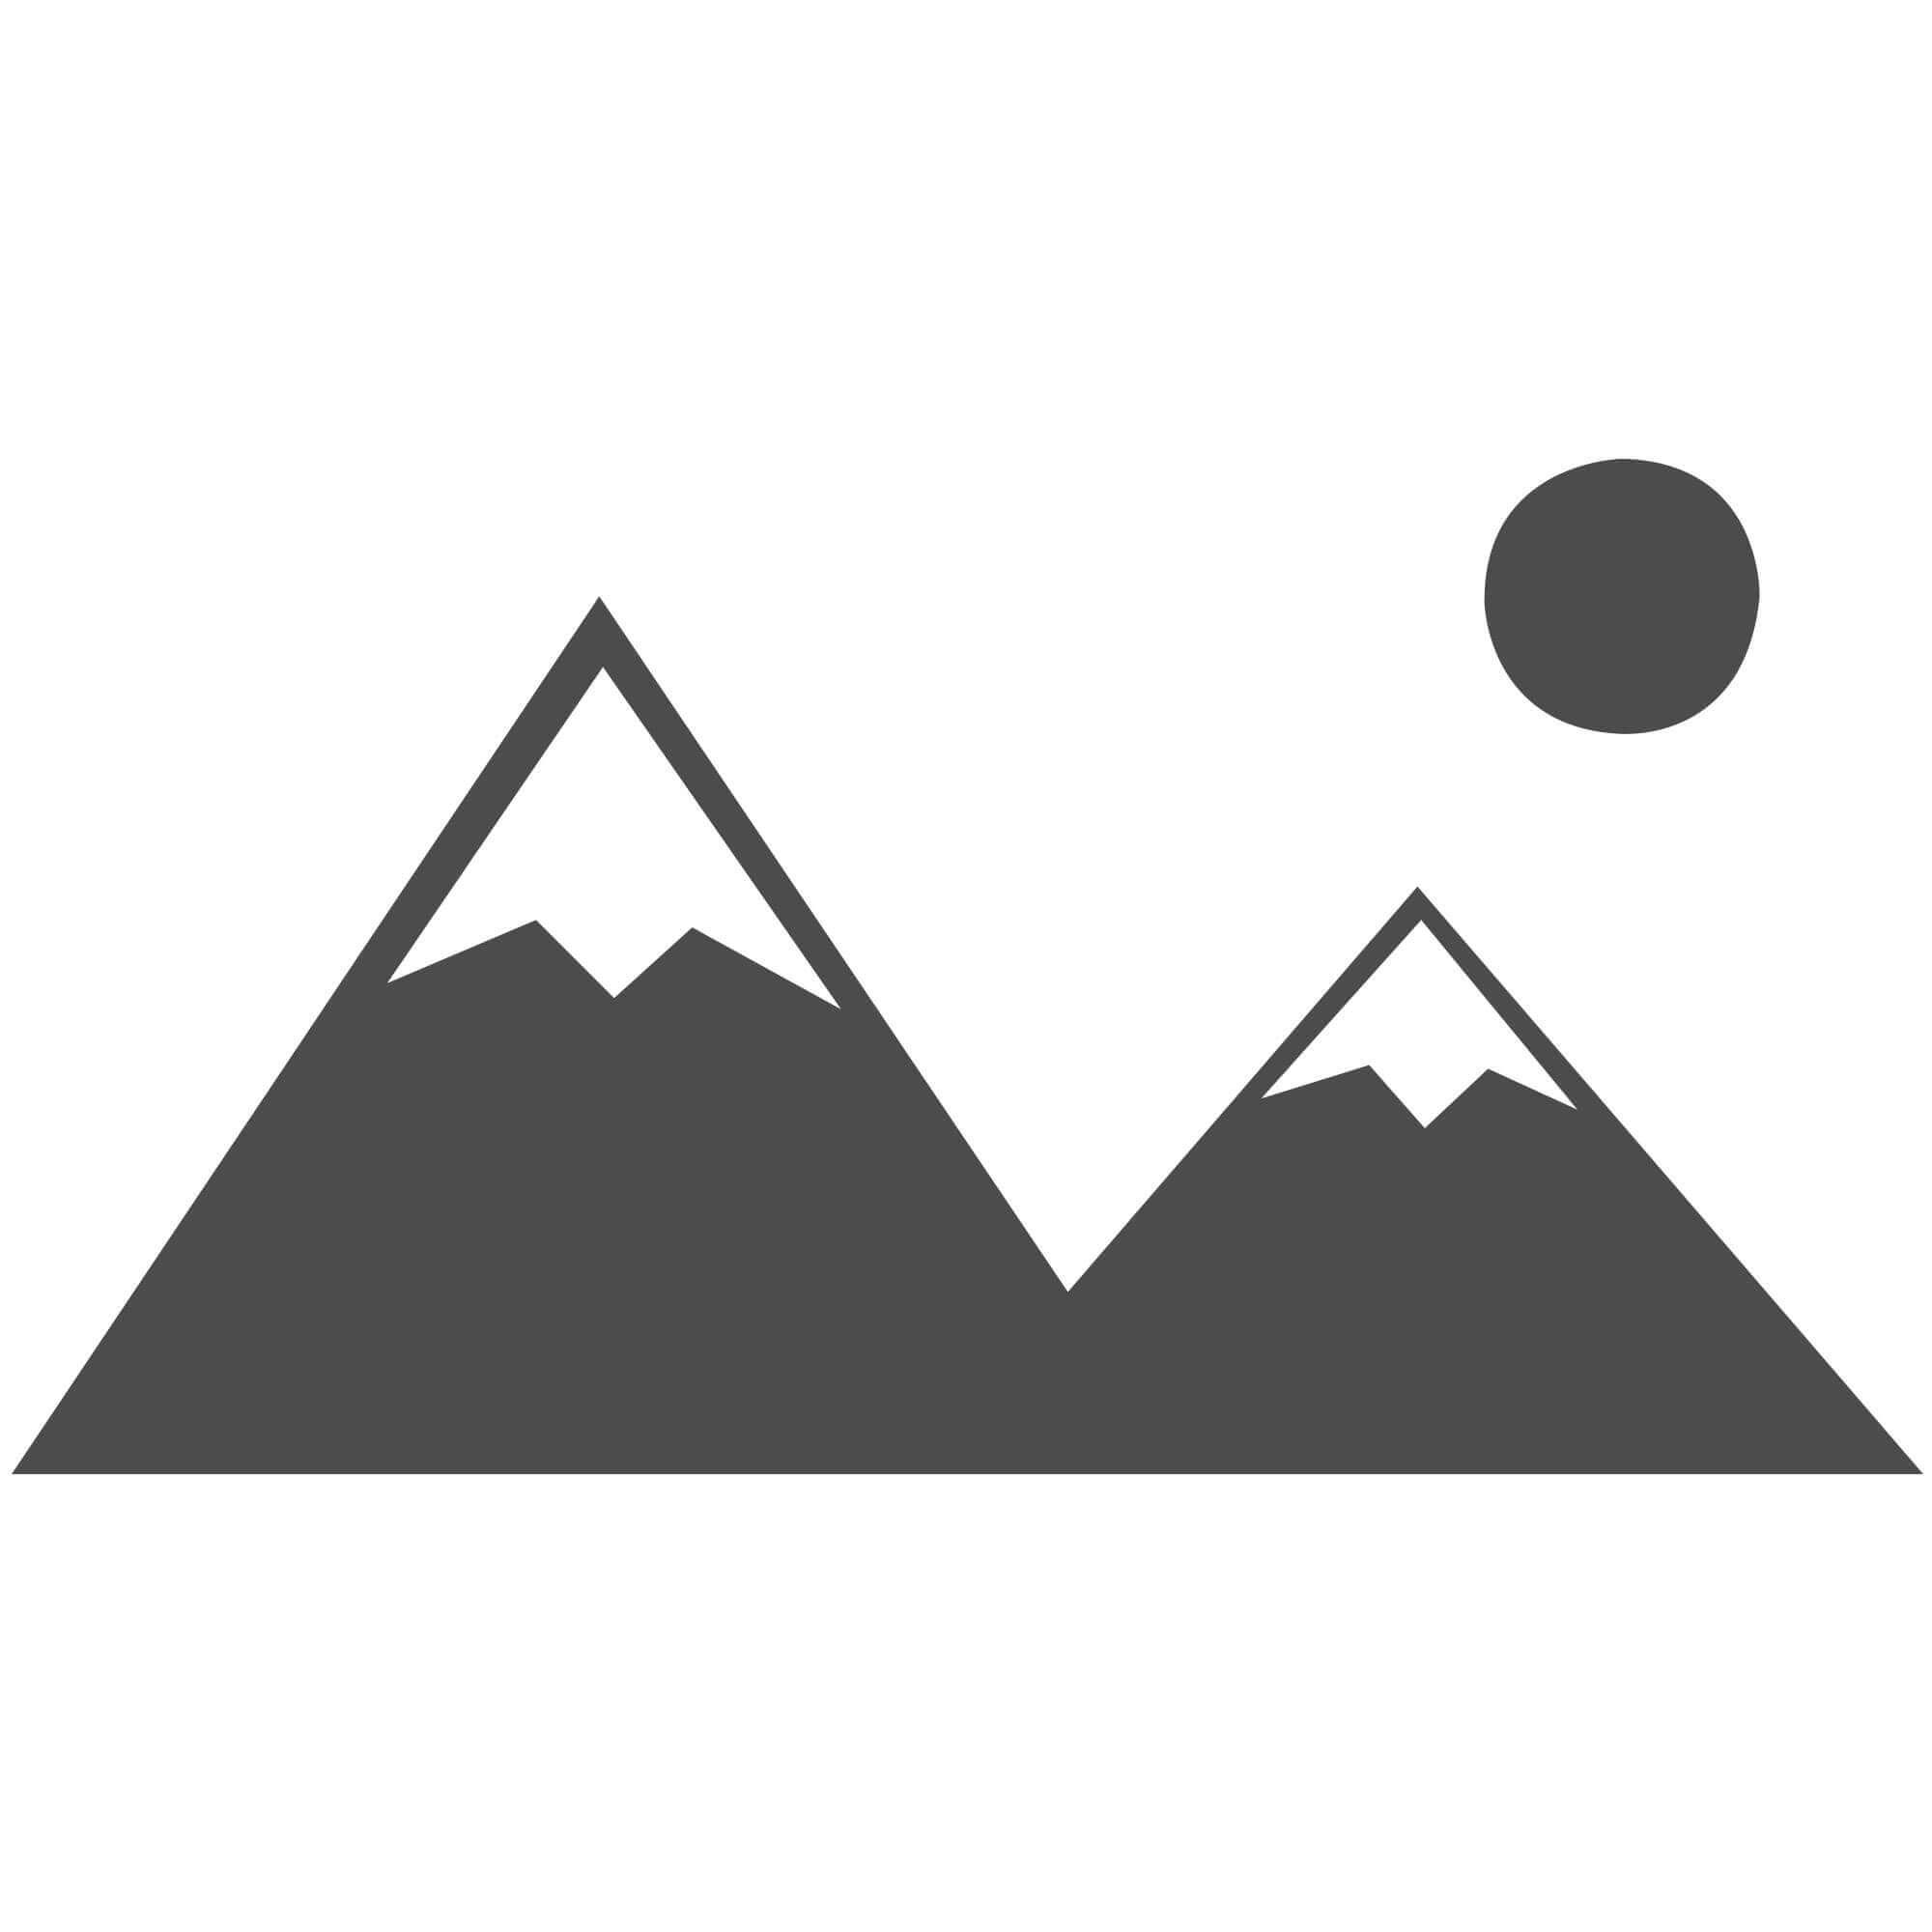 Royal Traditional Wool Rug - Red-Half Moon 67 x 137 cm